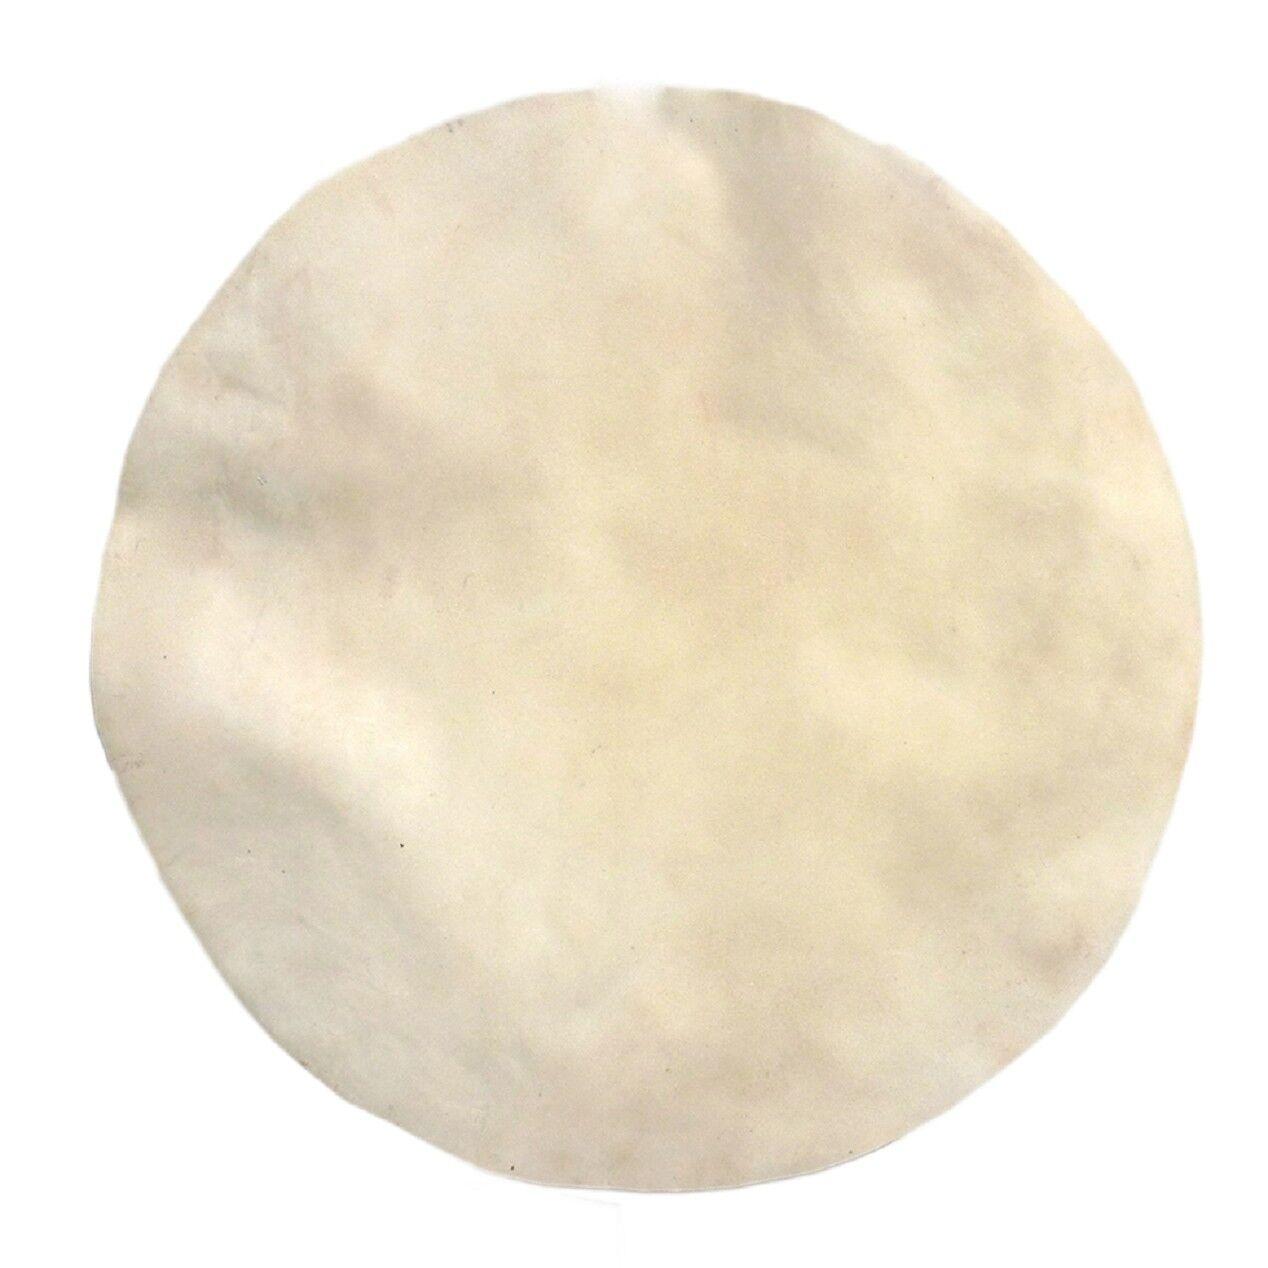 MRC 30 inch Diameter Weiß Calfskin Drum Head 3 mil = Ultra Thin